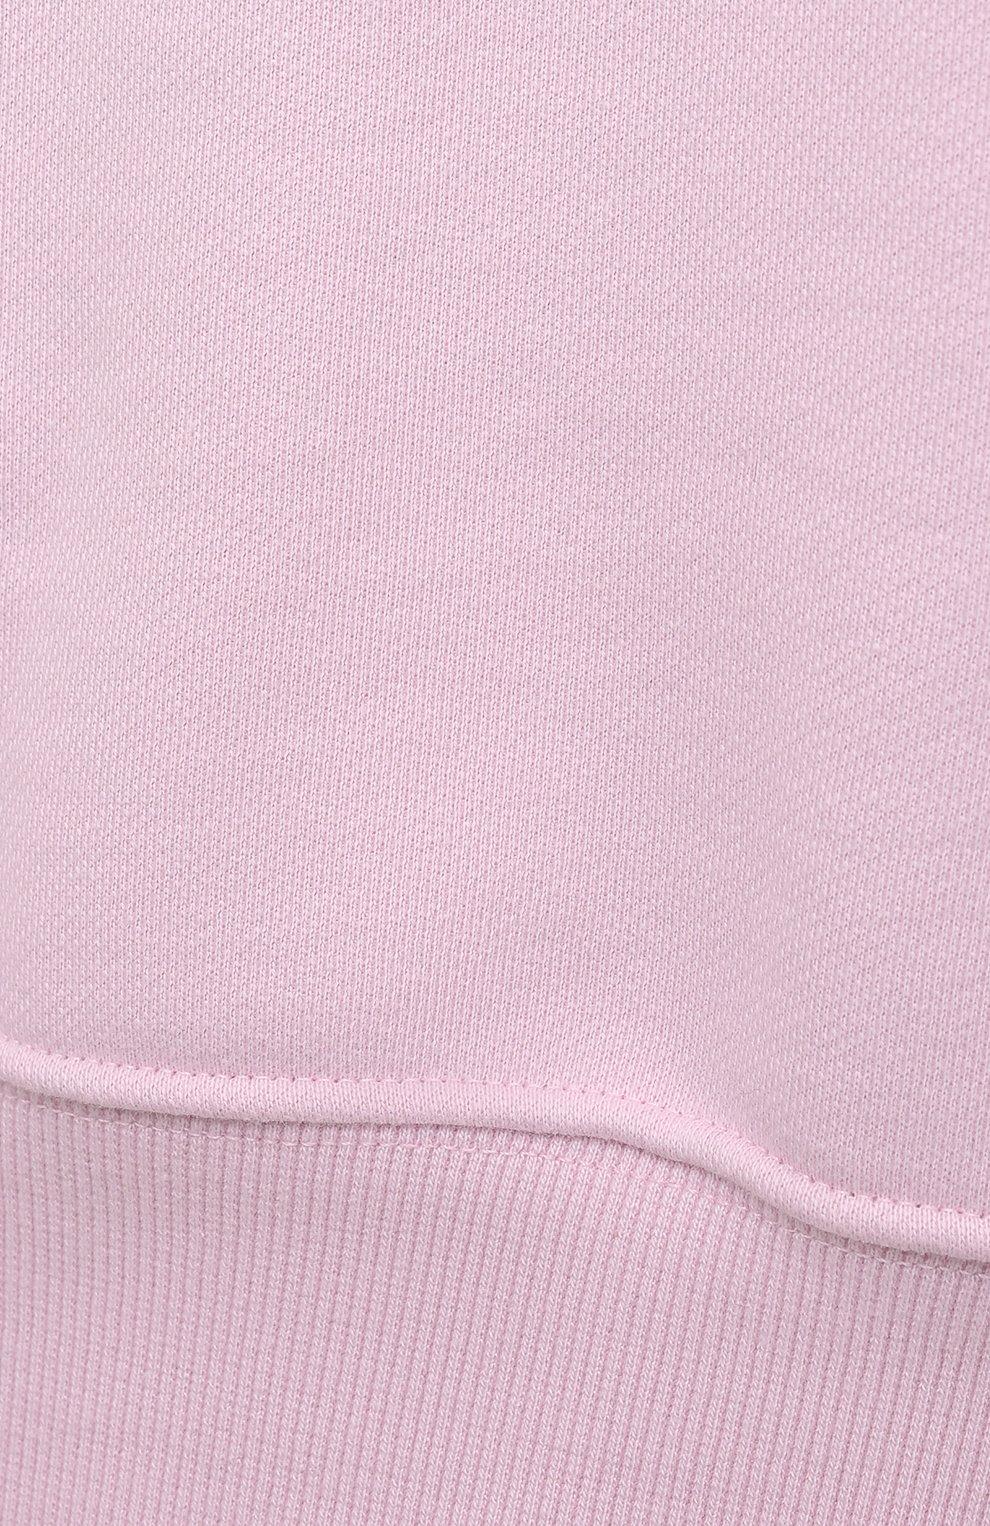 Женский хлопковый свитшот THE FRANKIE SHOP розового цвета, арт. SW VAN KR 08 | Фото 5